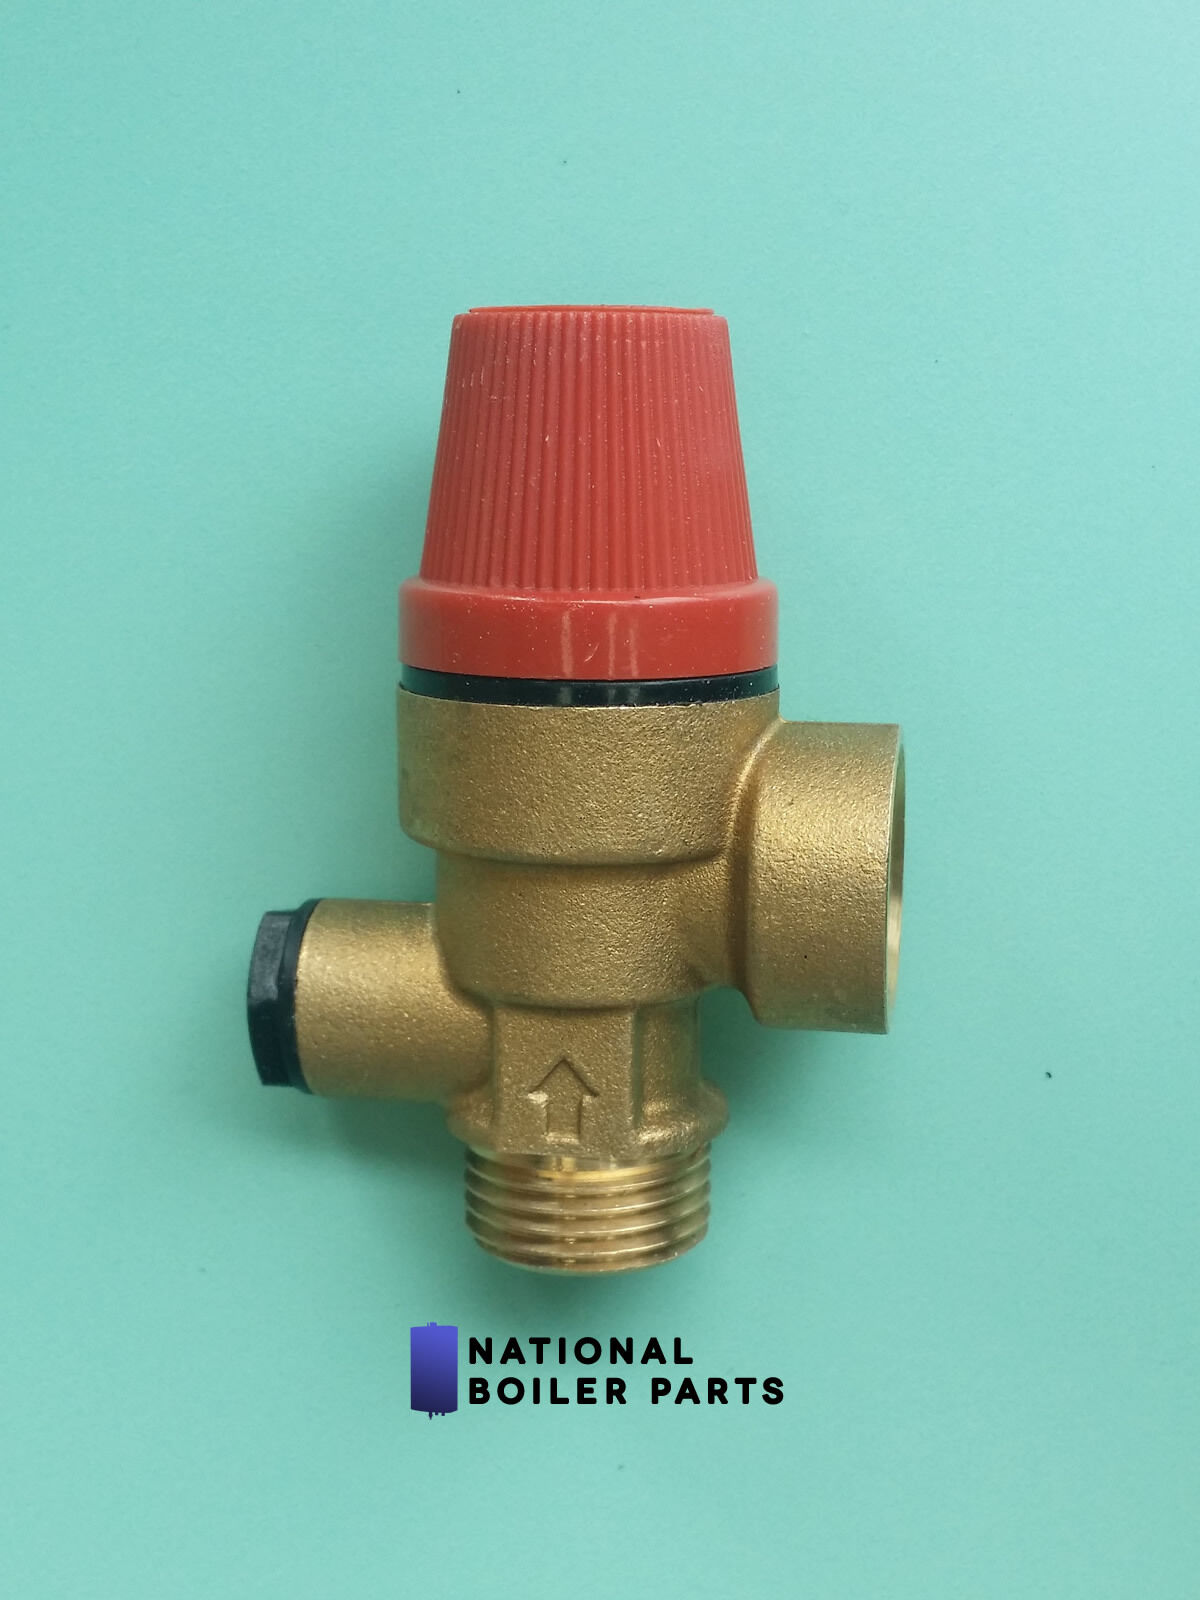 Potterton 8430044 Spare Boiler Safety Pressure Relief Valve   eBay